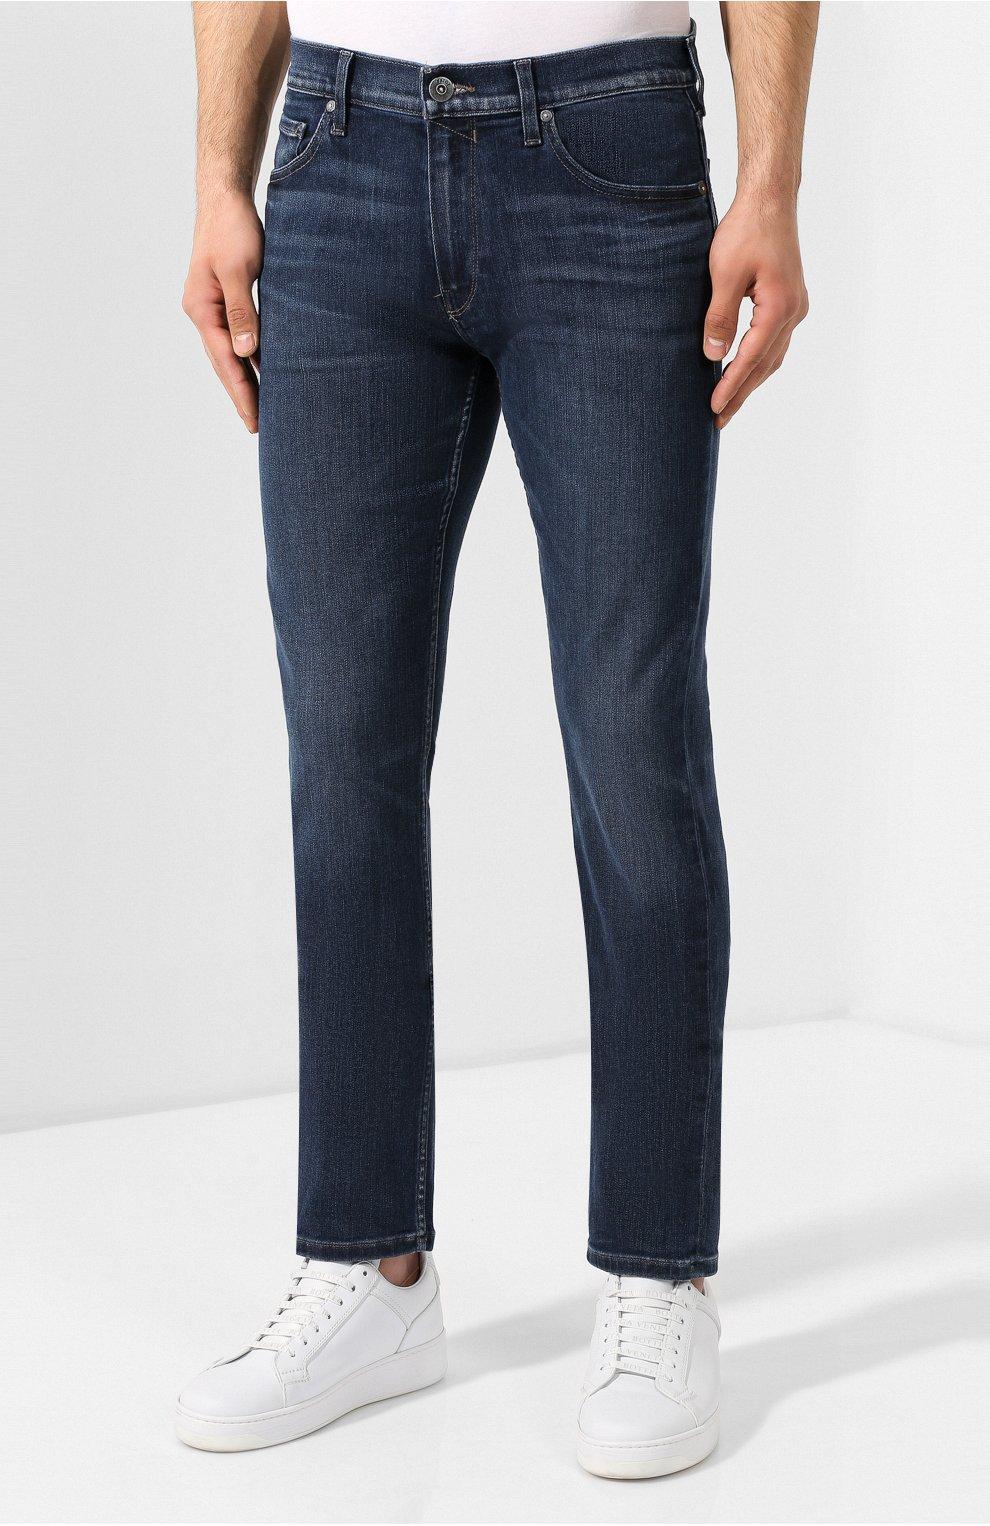 Мужские джинсы PAIGE синего цвета, арт. M653C72-7156 | Фото 3